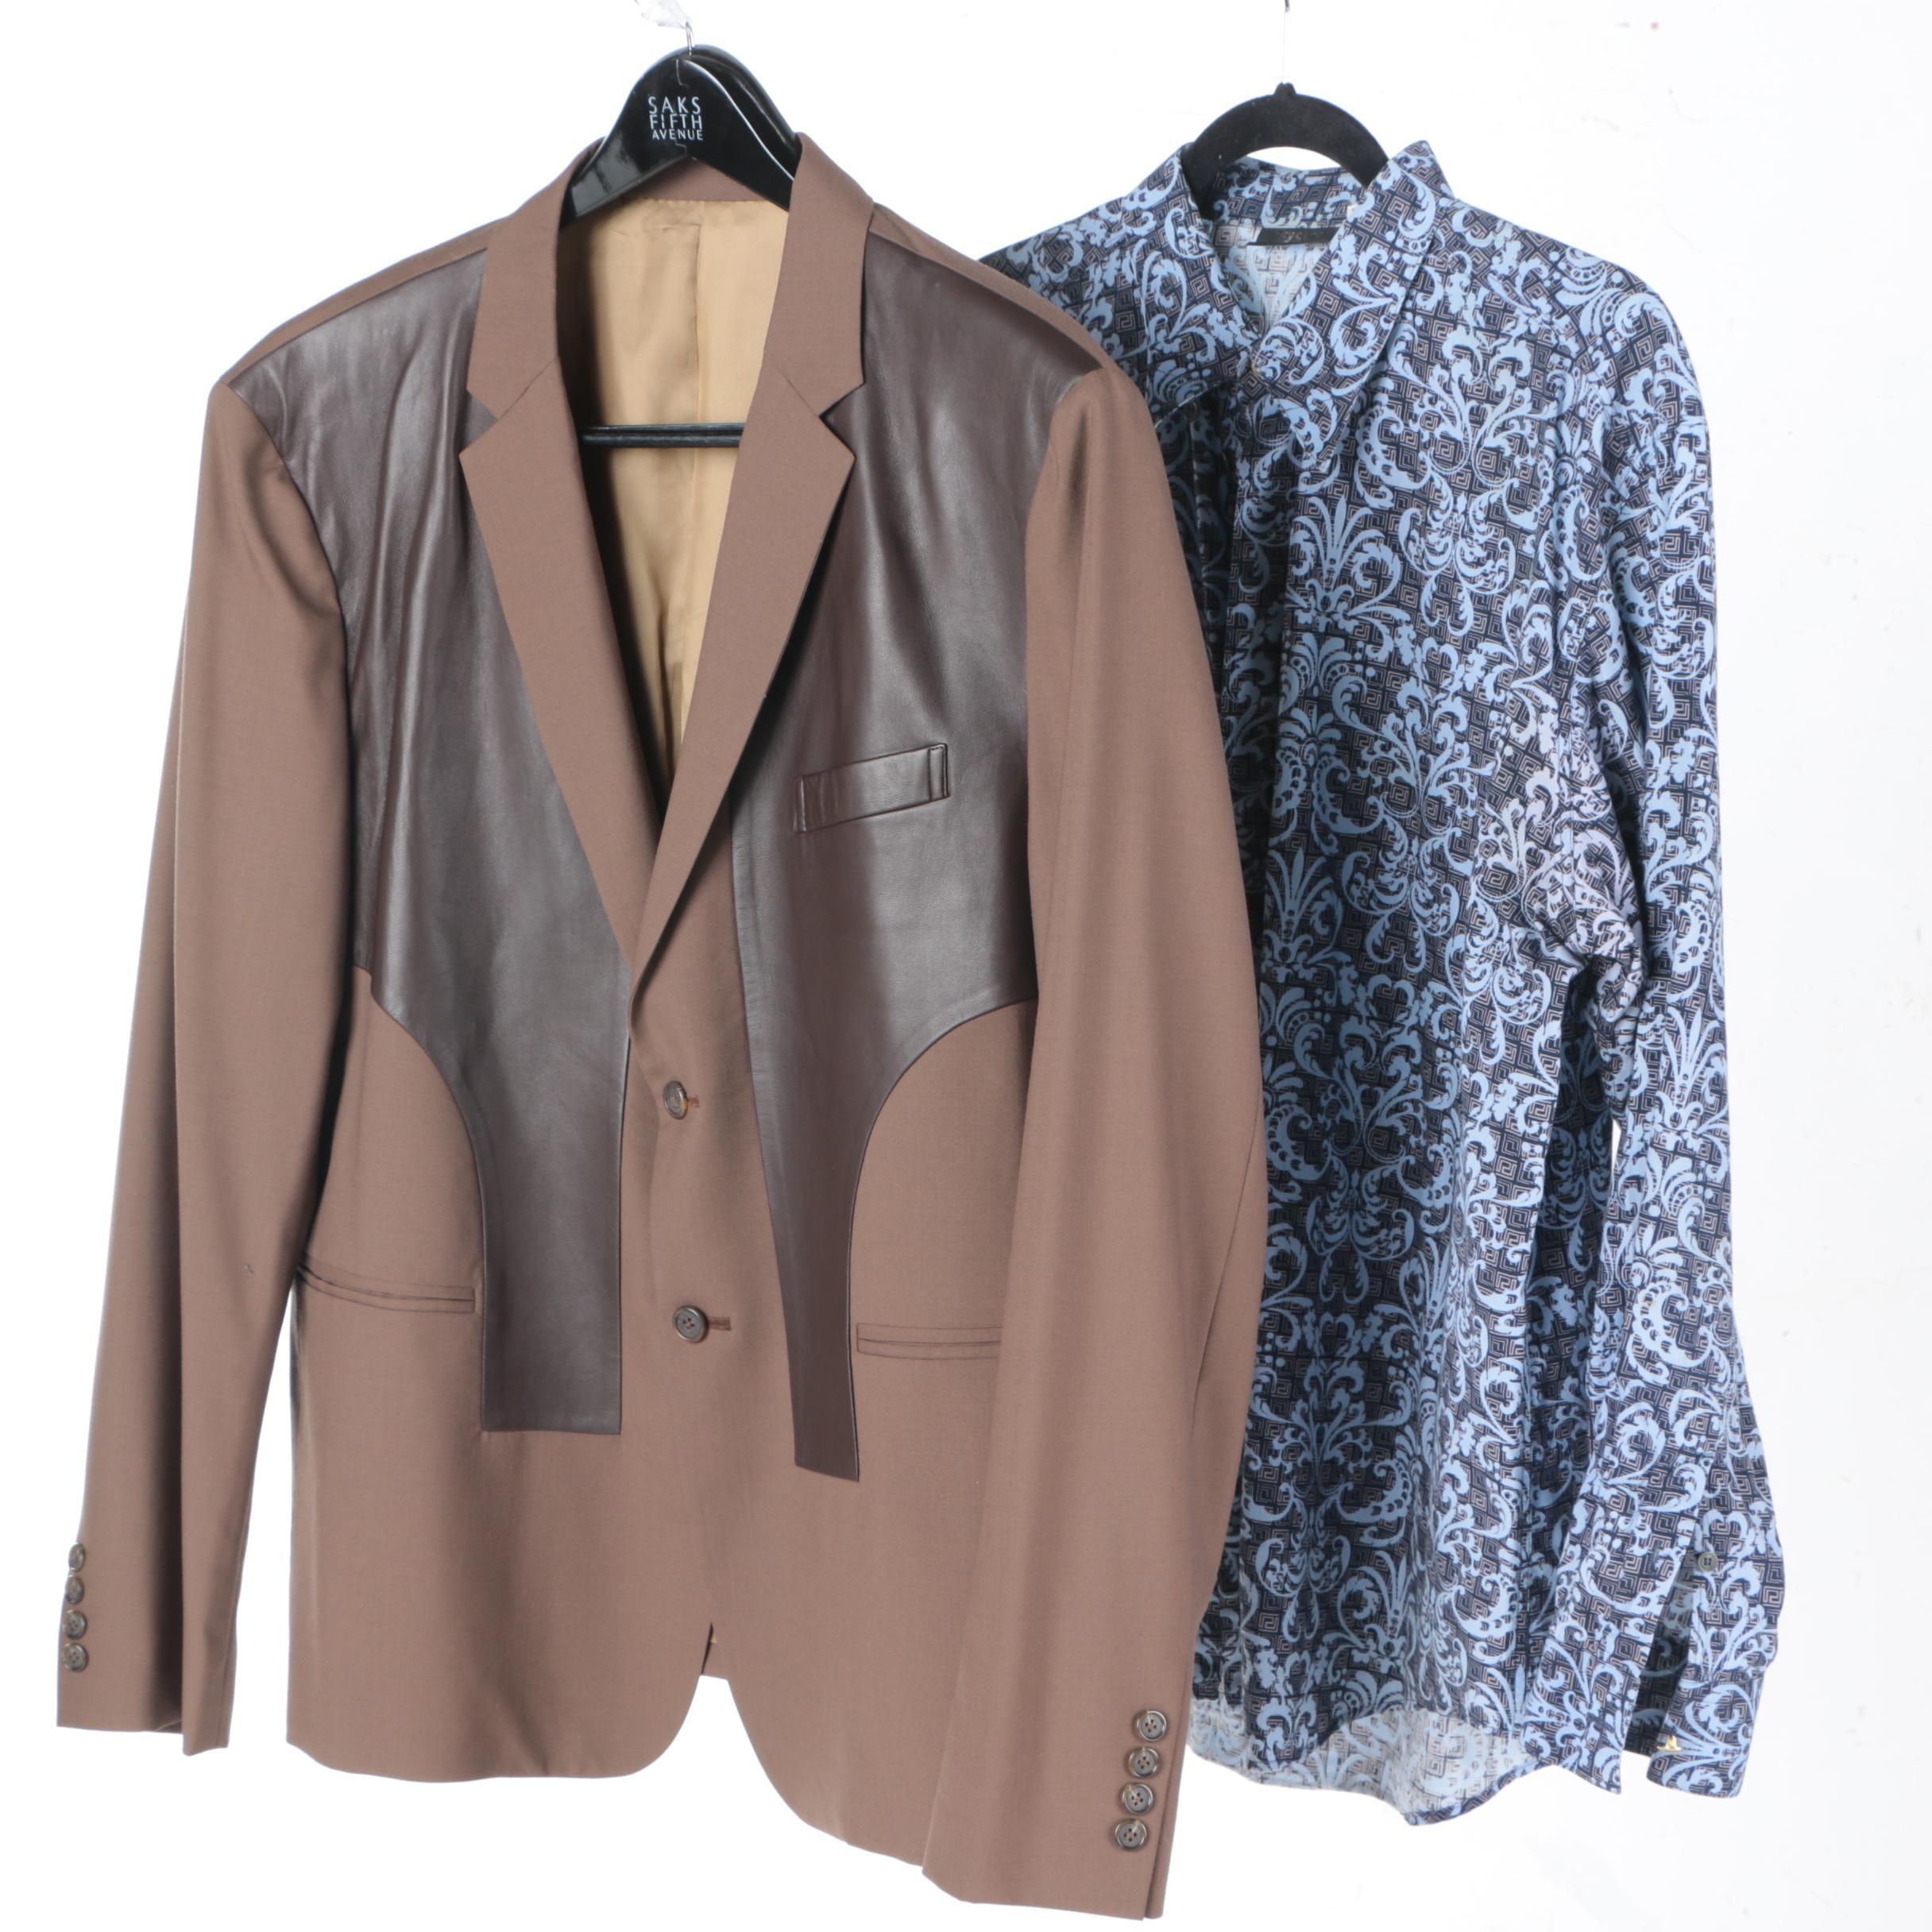 Versace Shirt and Custom Western Blazer